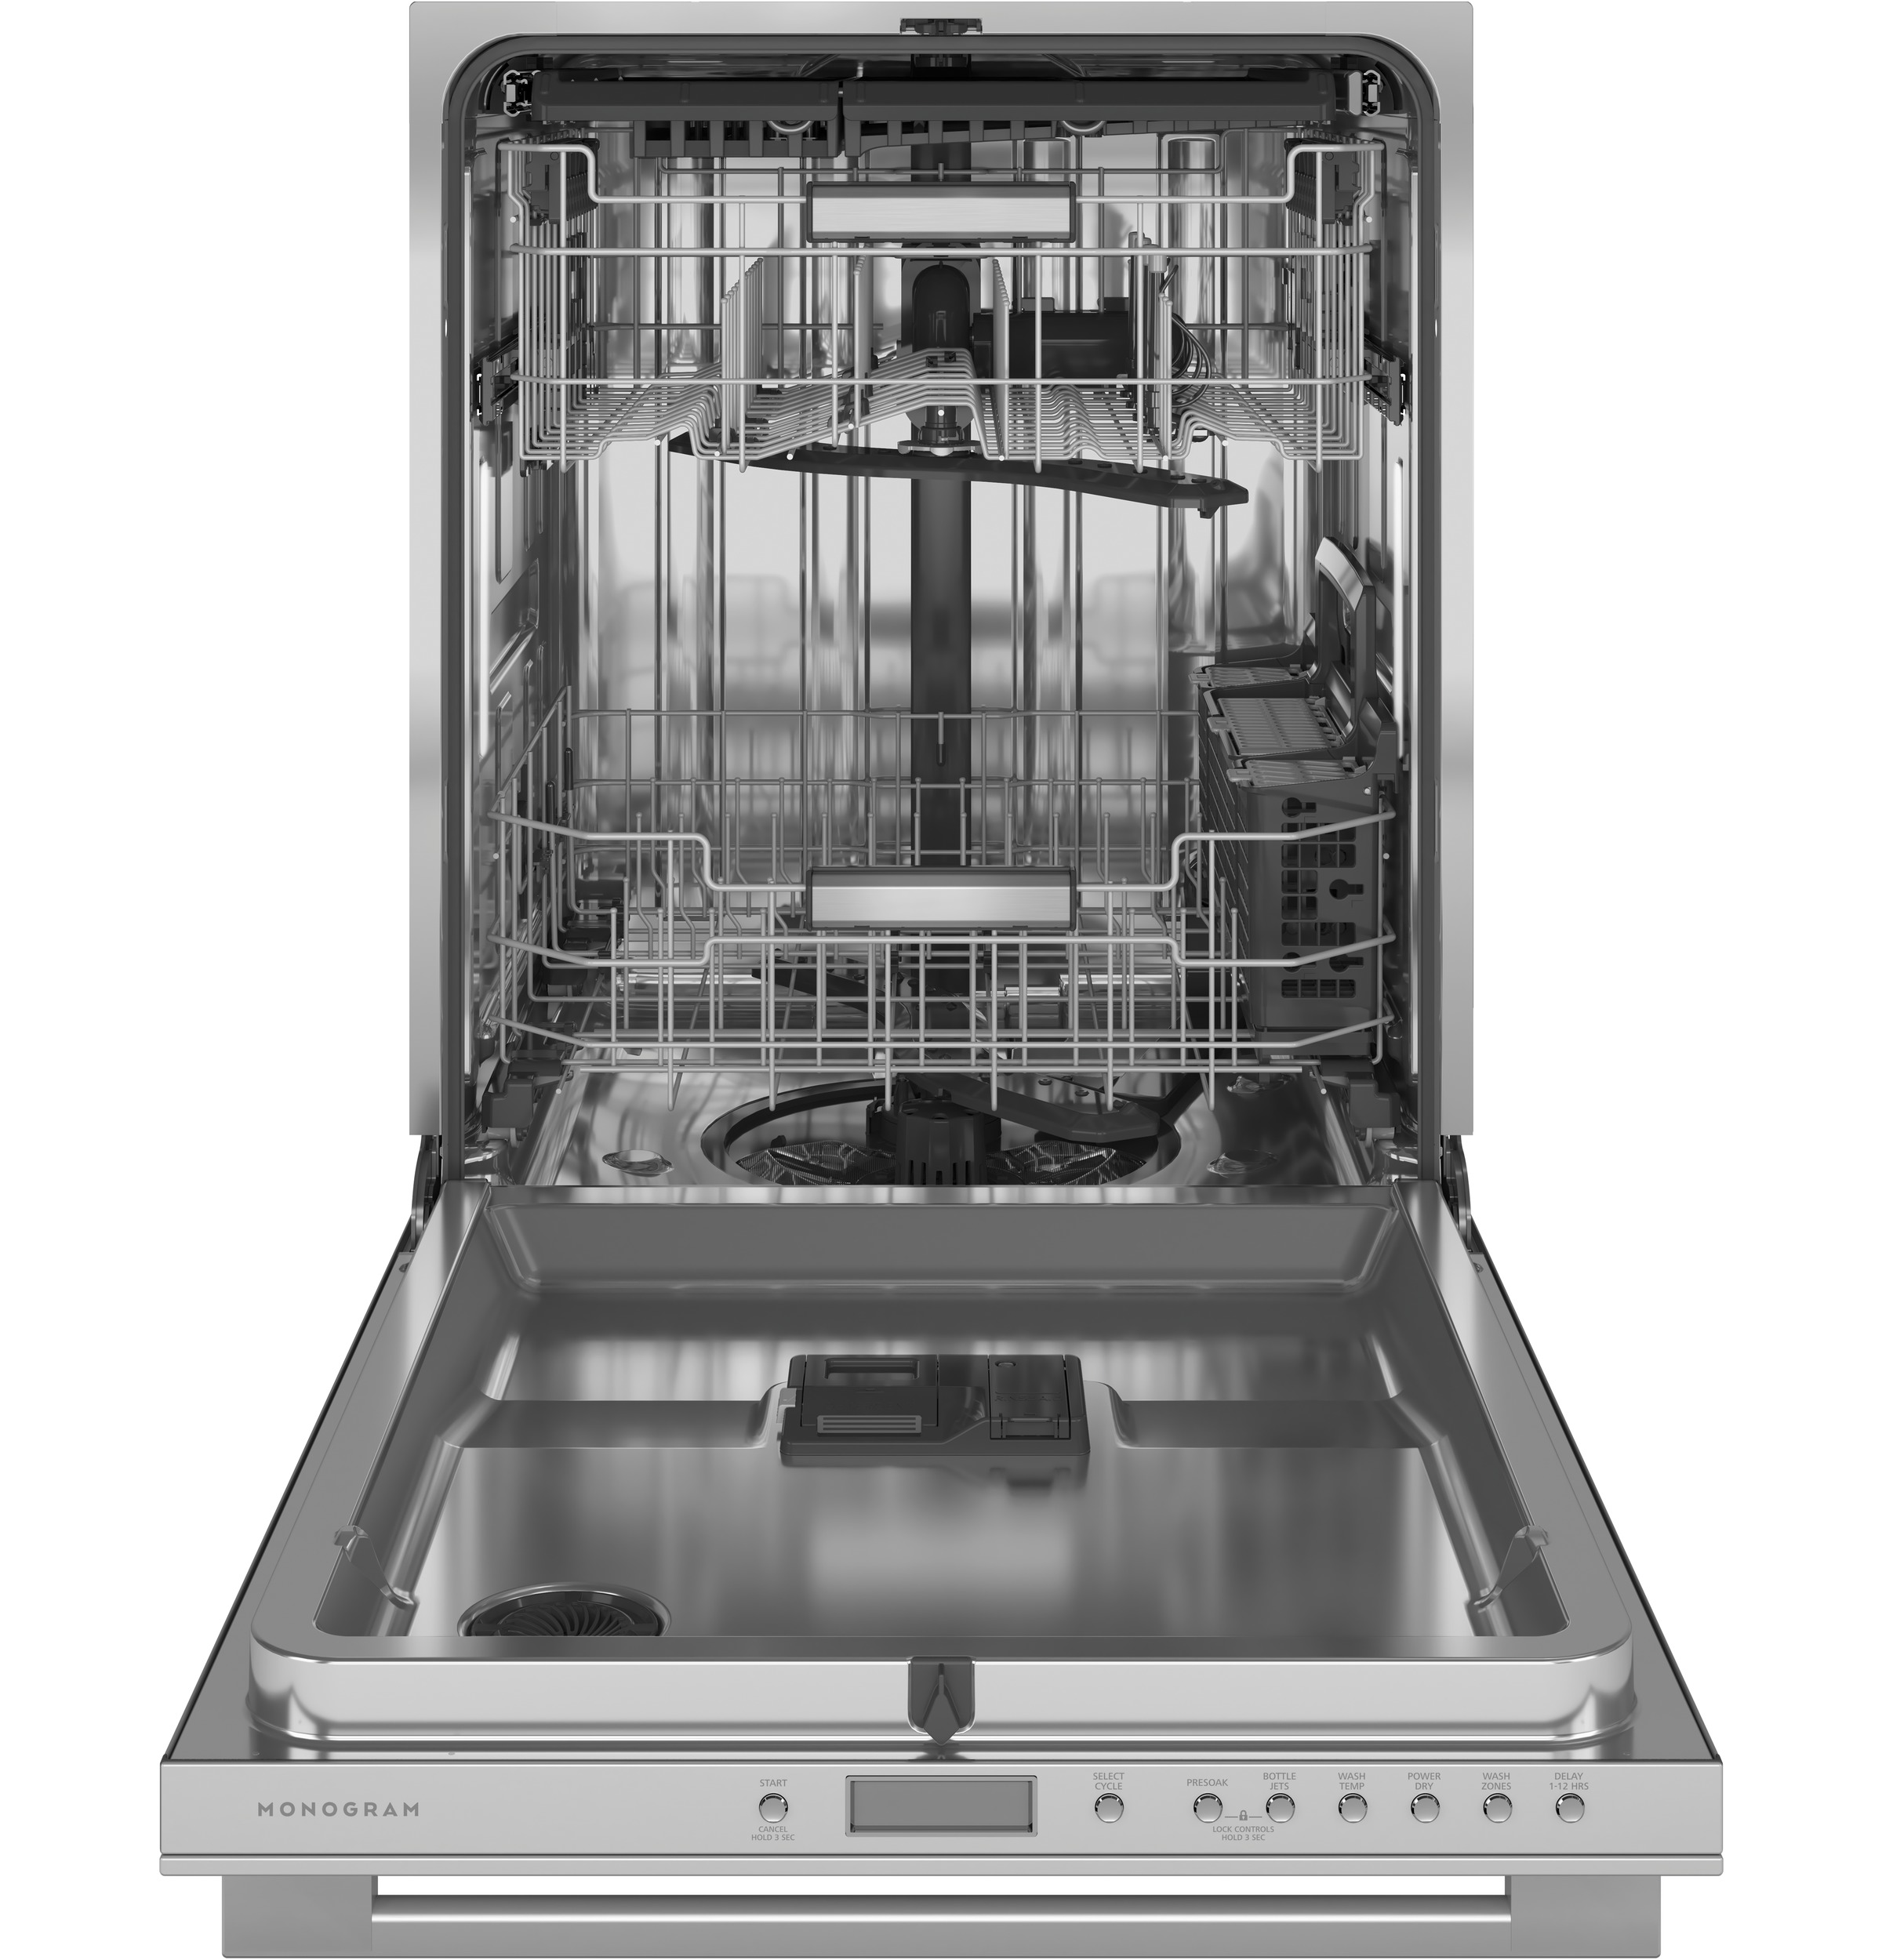 Model: ZDT985SSNSS | Monogram Monogram Smart Fully Integrated Dishwasher